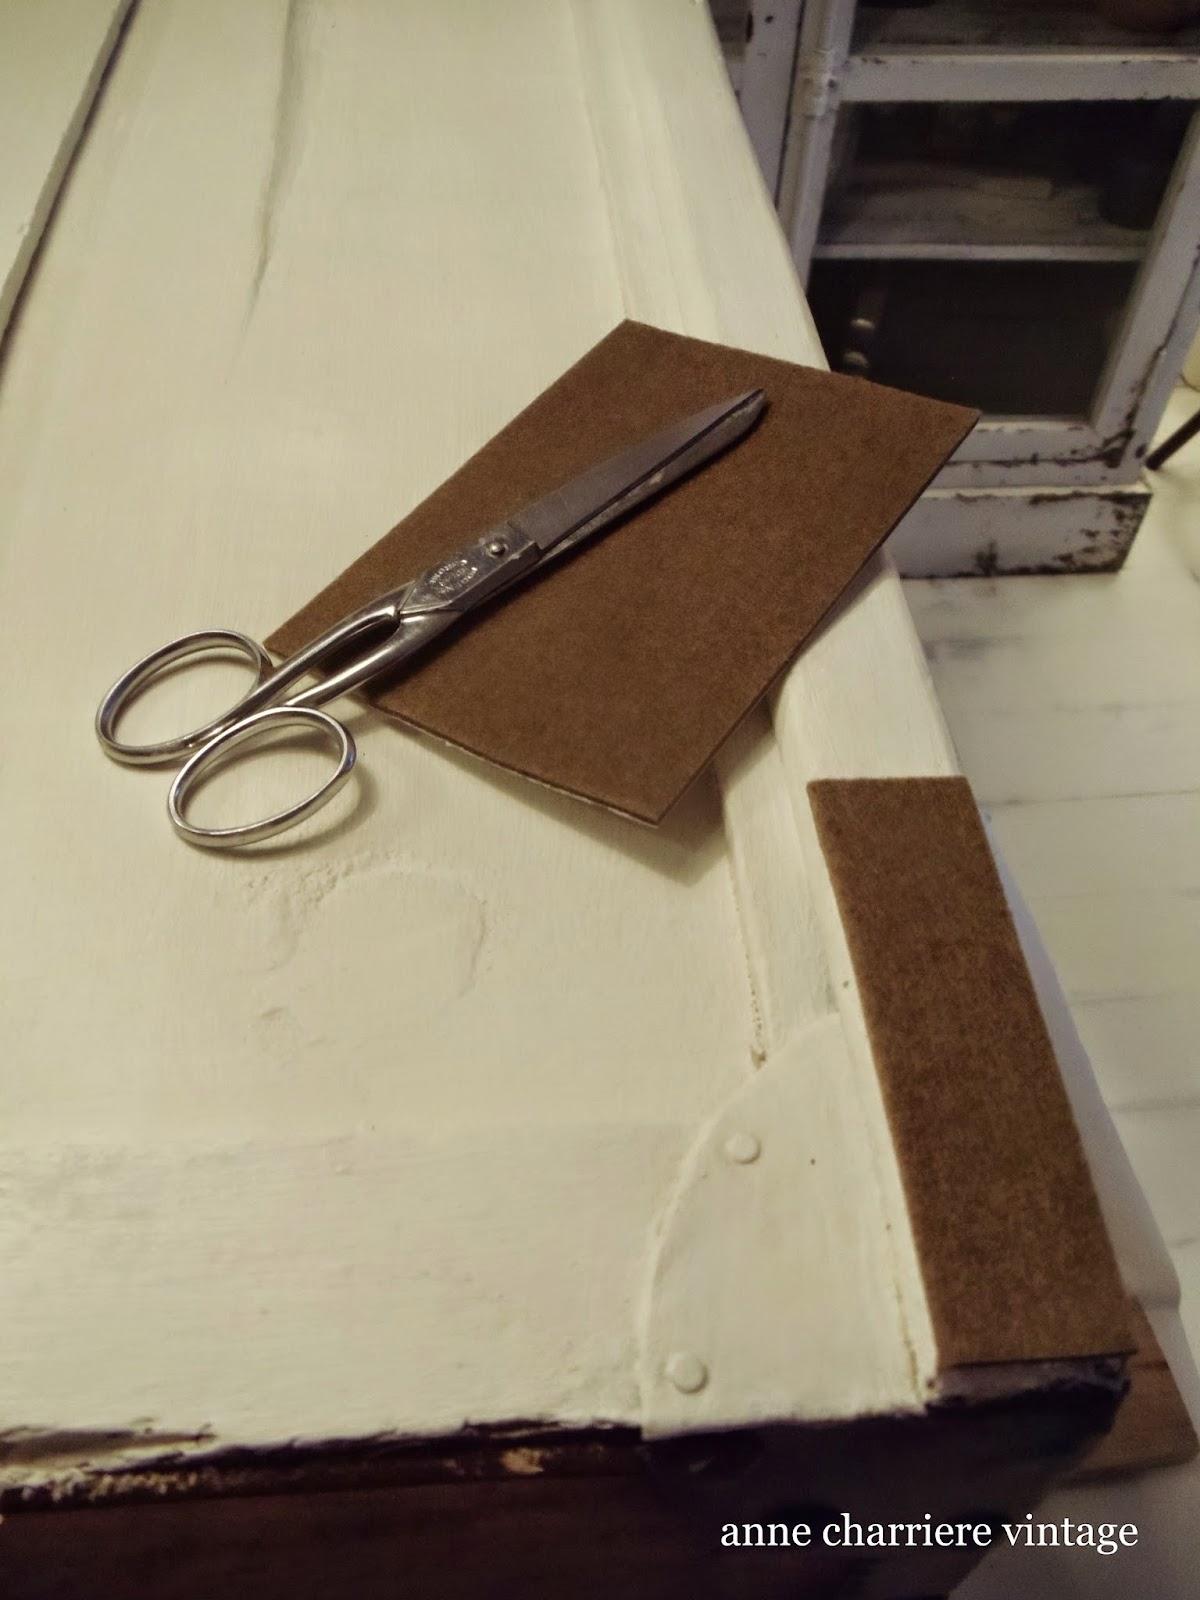 www.annecharriere.com, anne charriere vintage, encerar baúl,